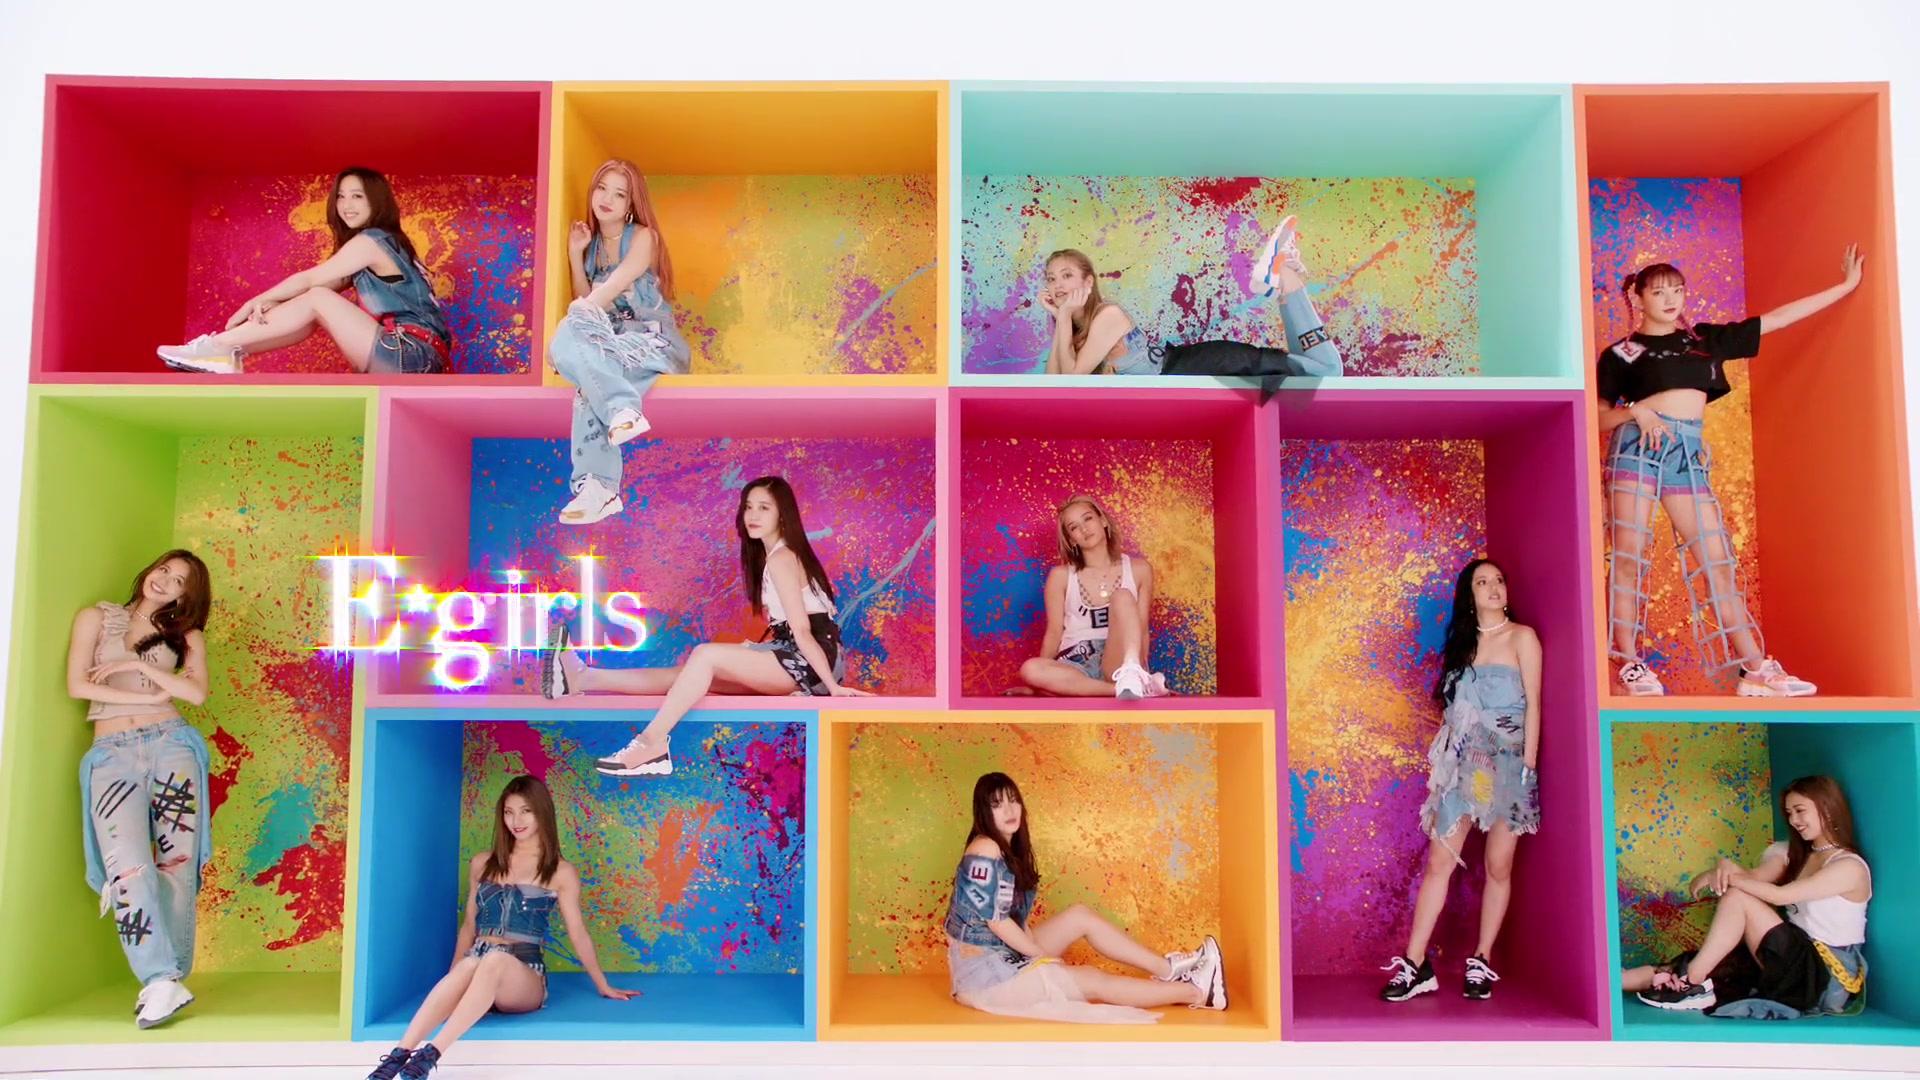 Cinderella Fit E Girls Subtle Or Not So Subtle Tribute To